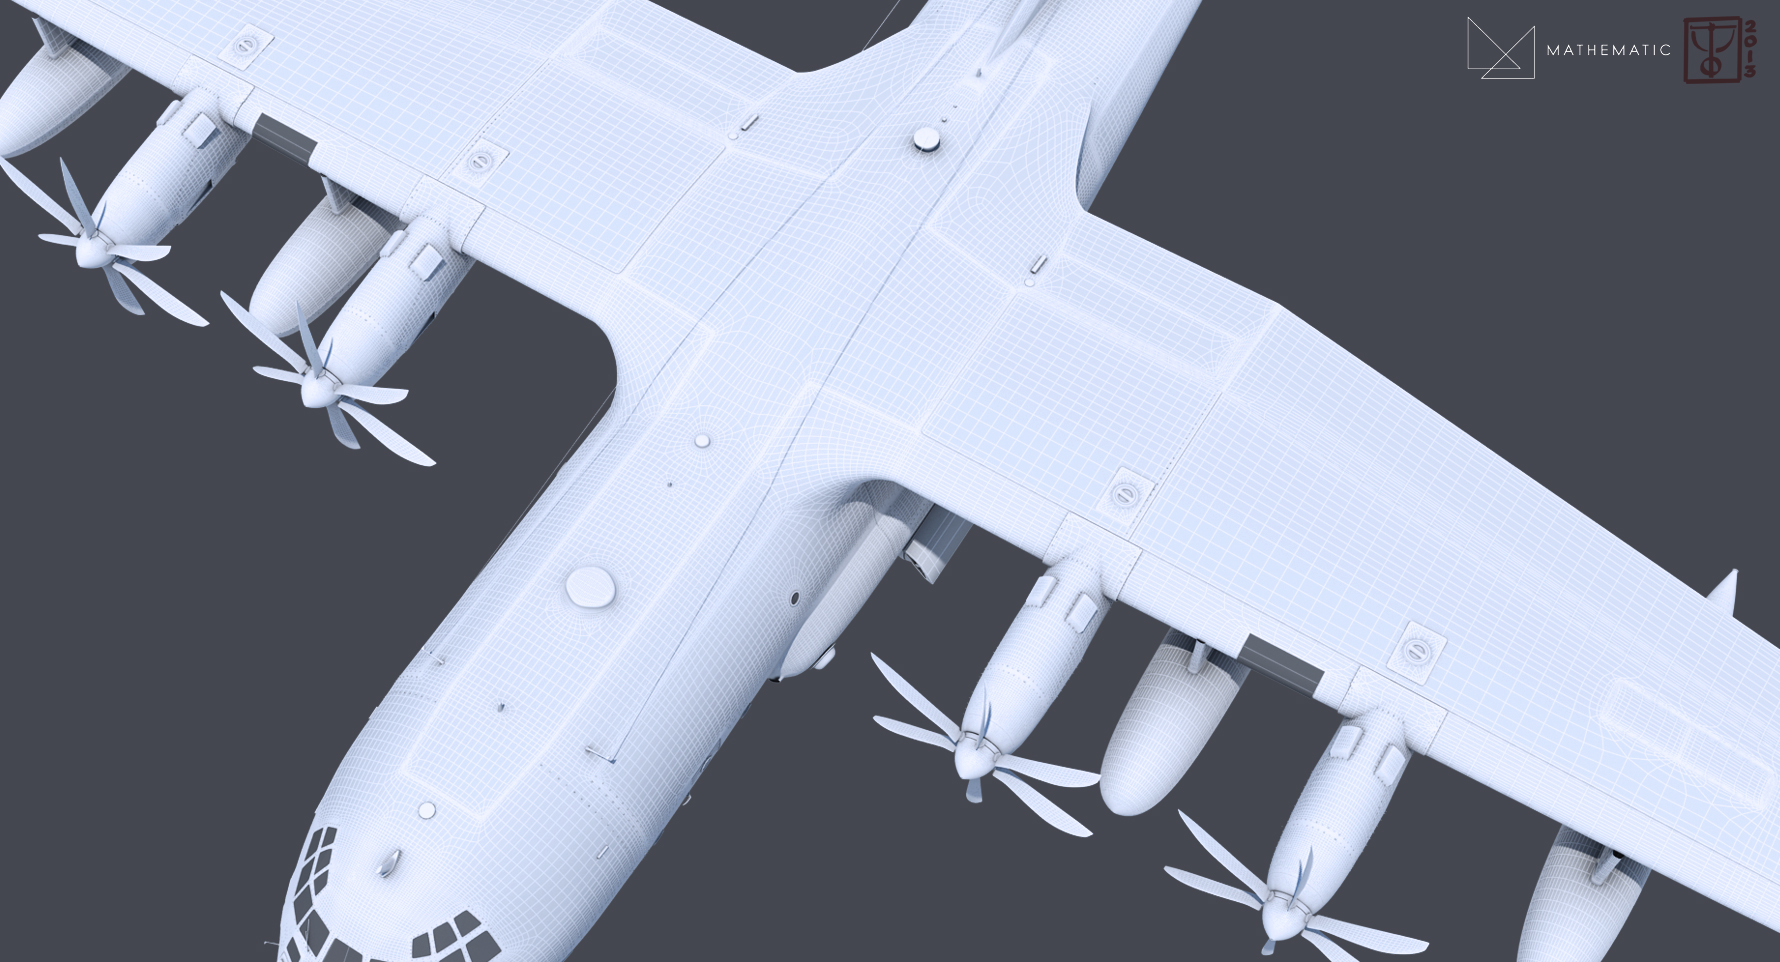 KC130_01.jpg